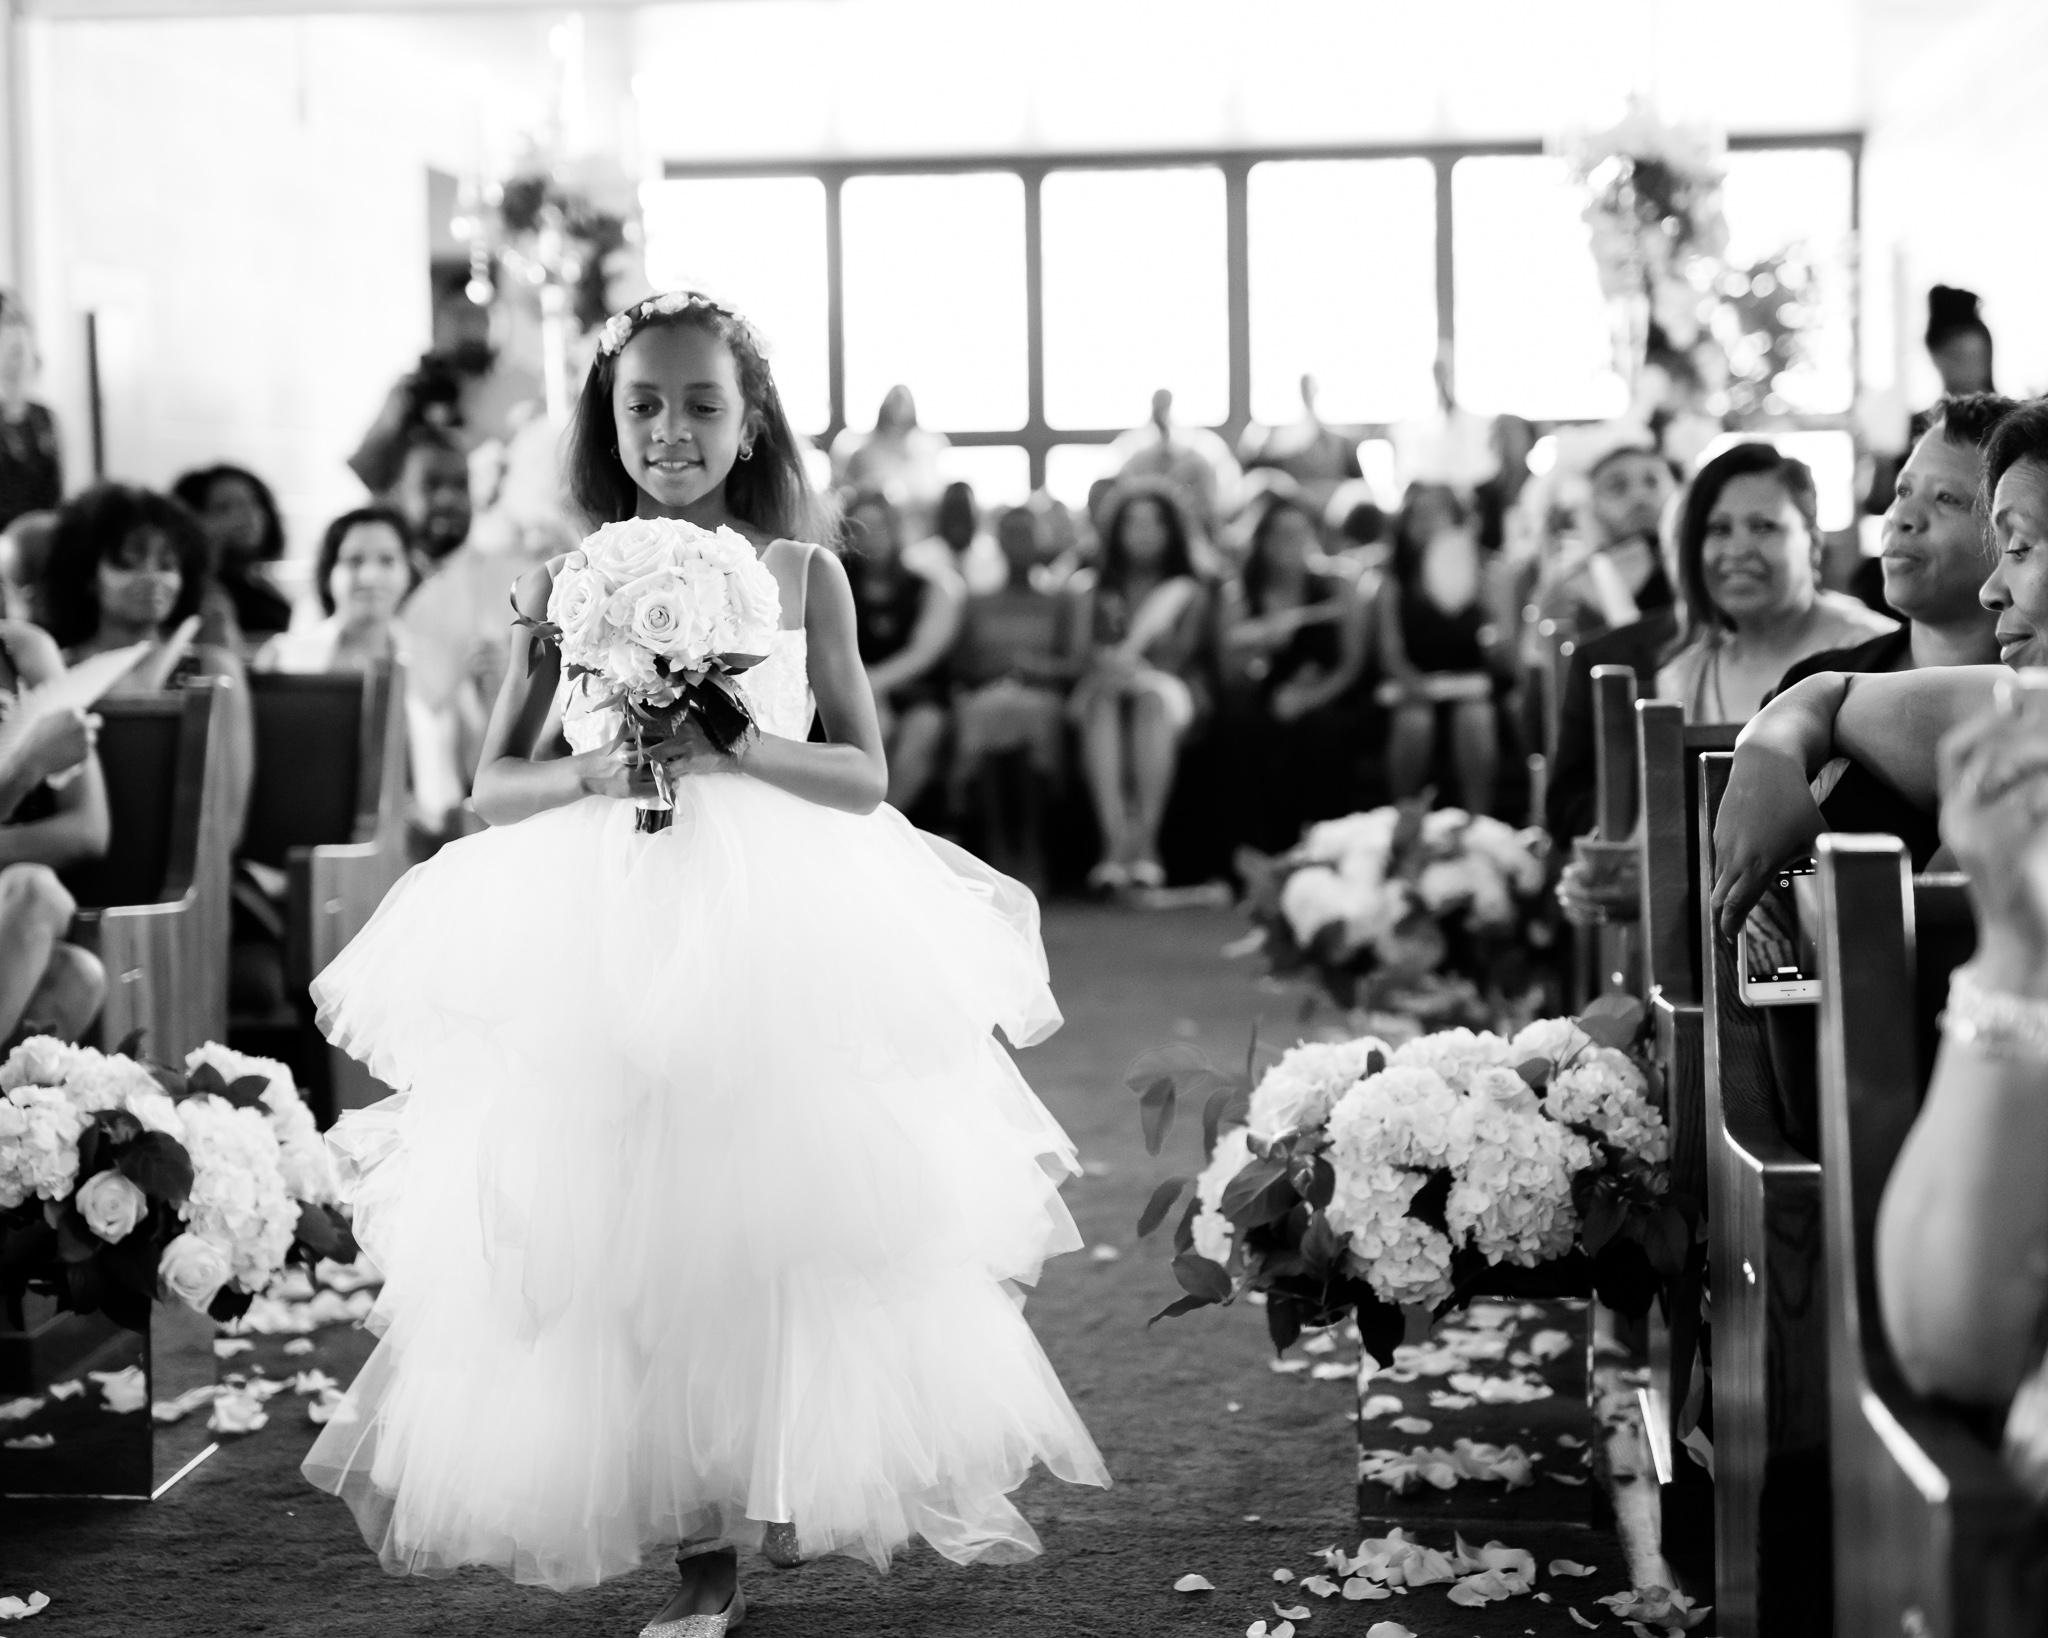 20180527wedding-gant-435-2.jpg